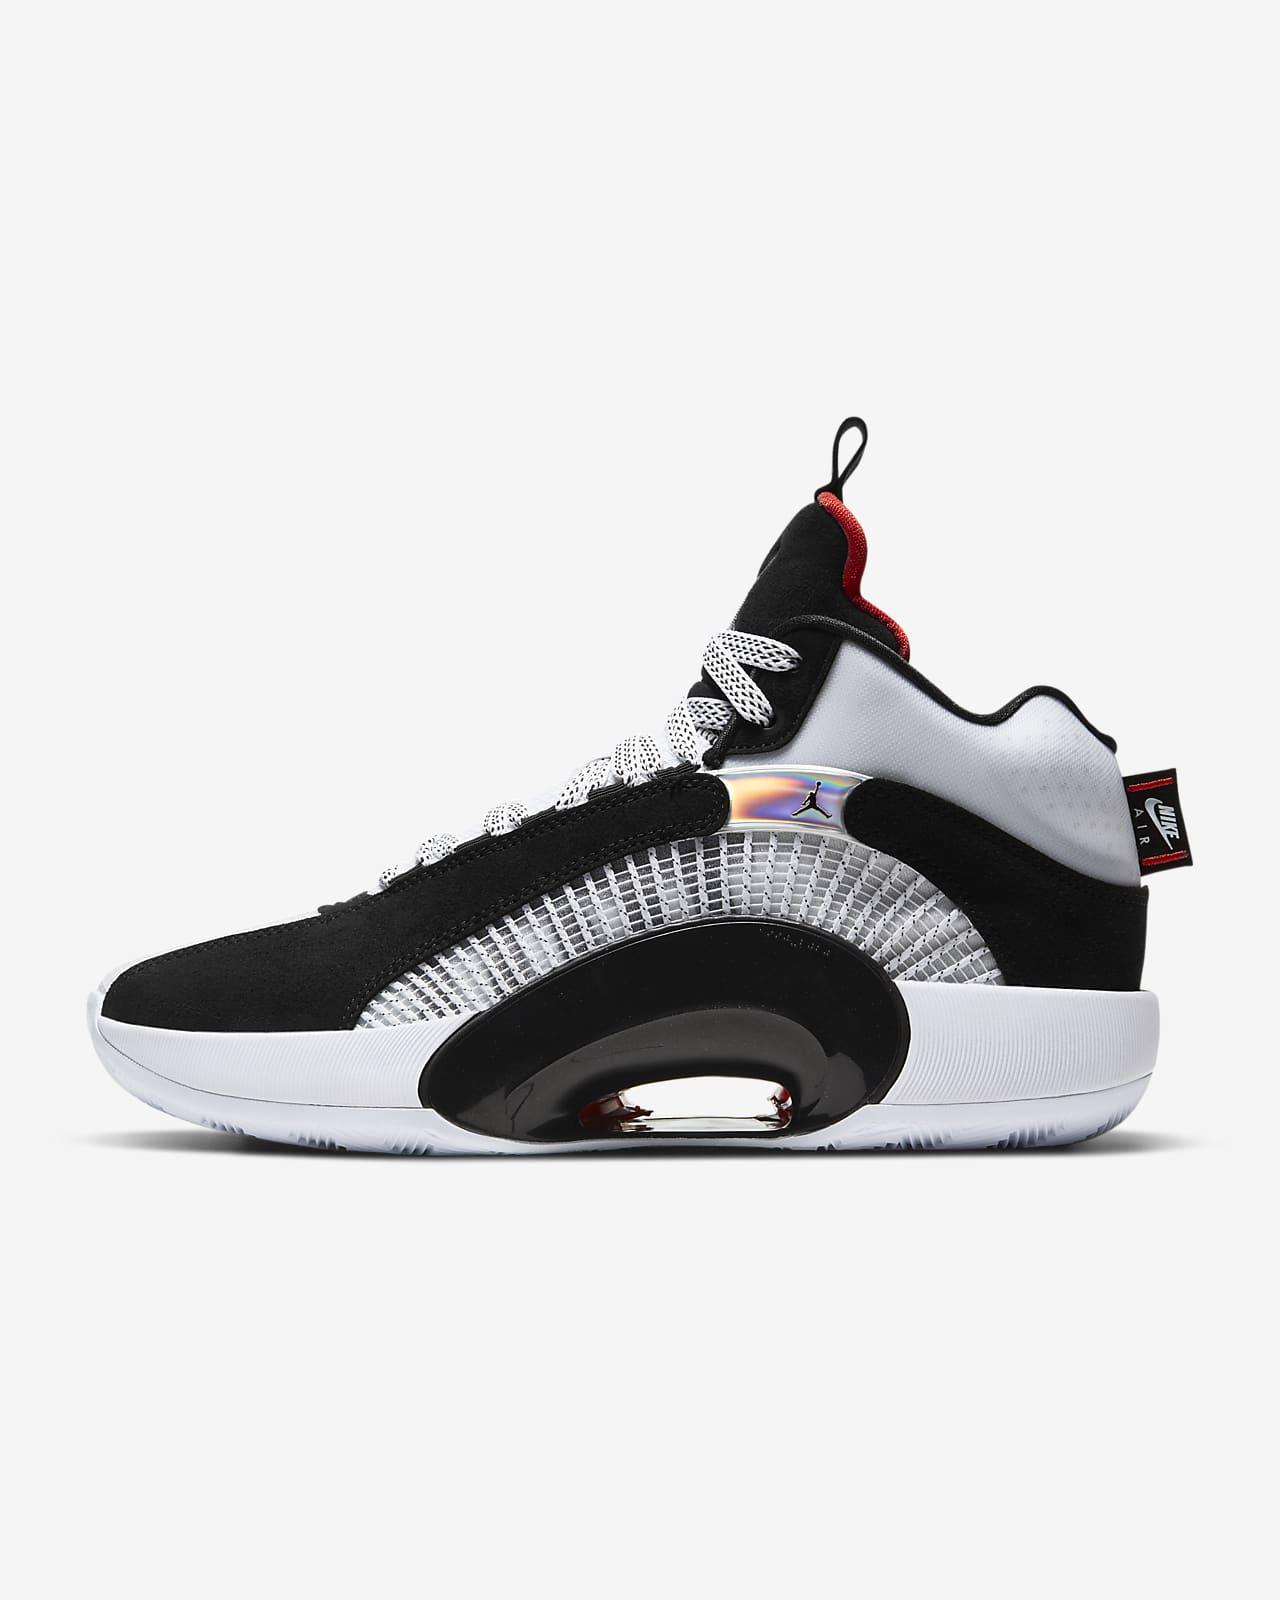 Air Jordan XXXV PF Basketball Shoe